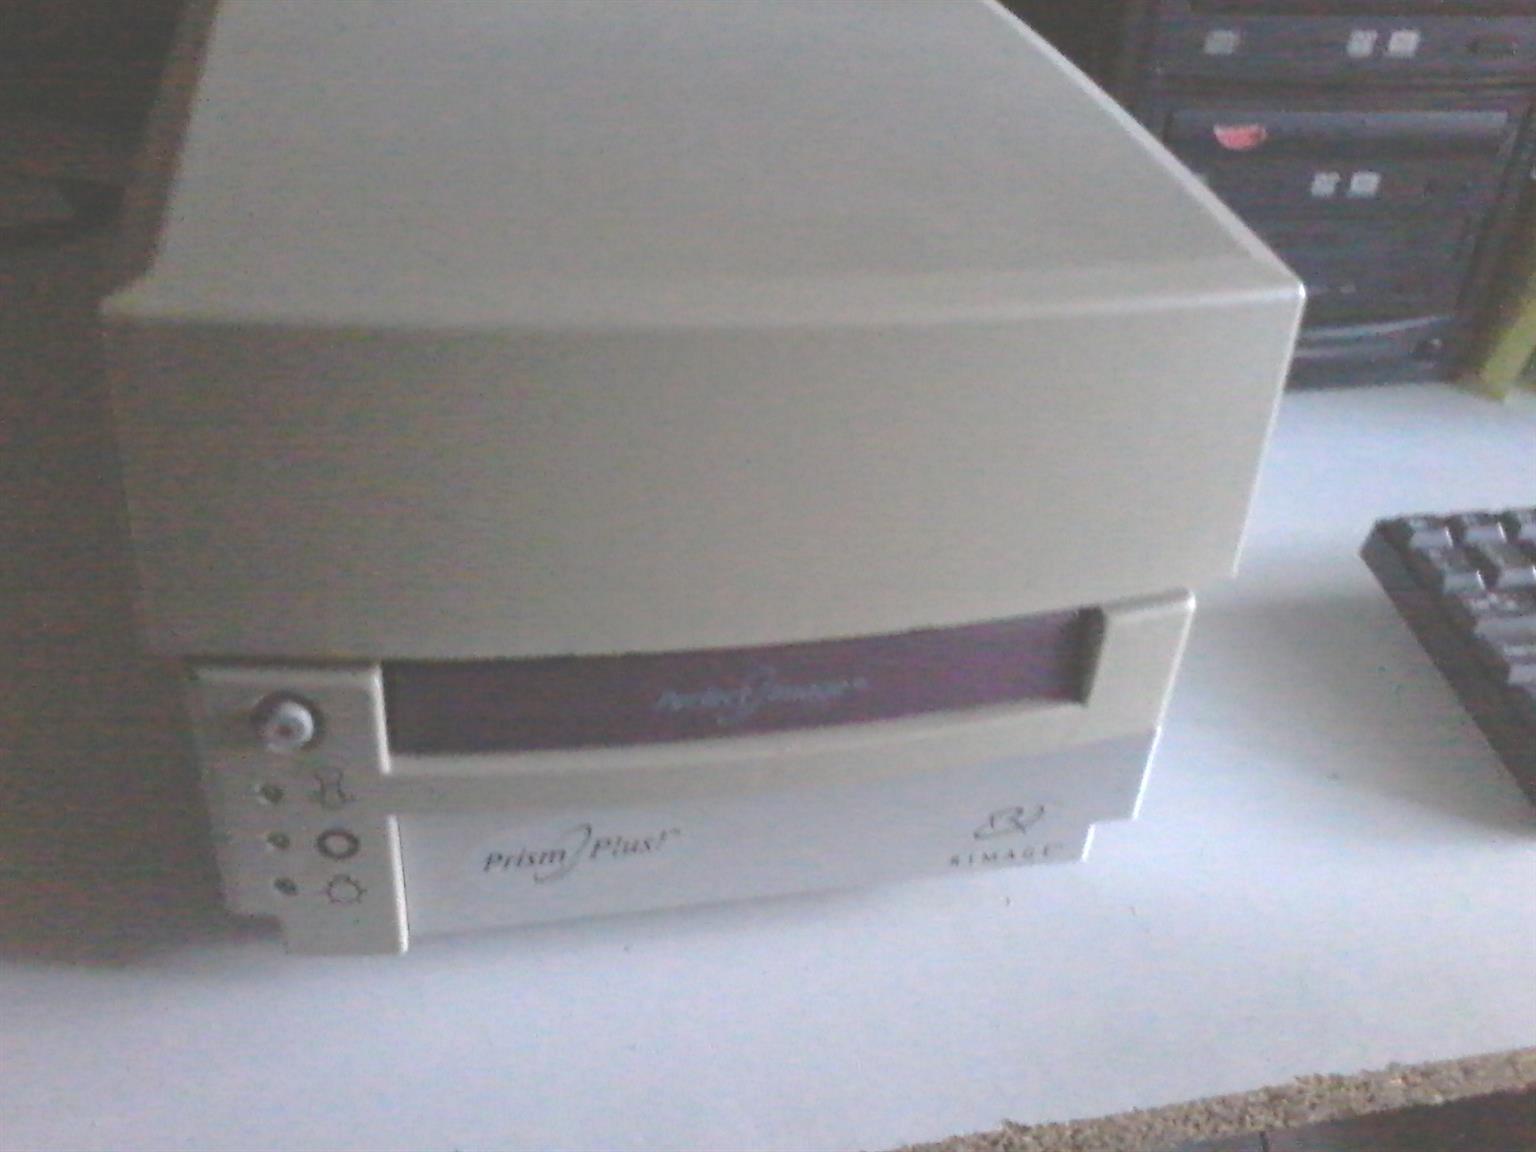 Rimage Prism plus printer with CD duplicator and computer